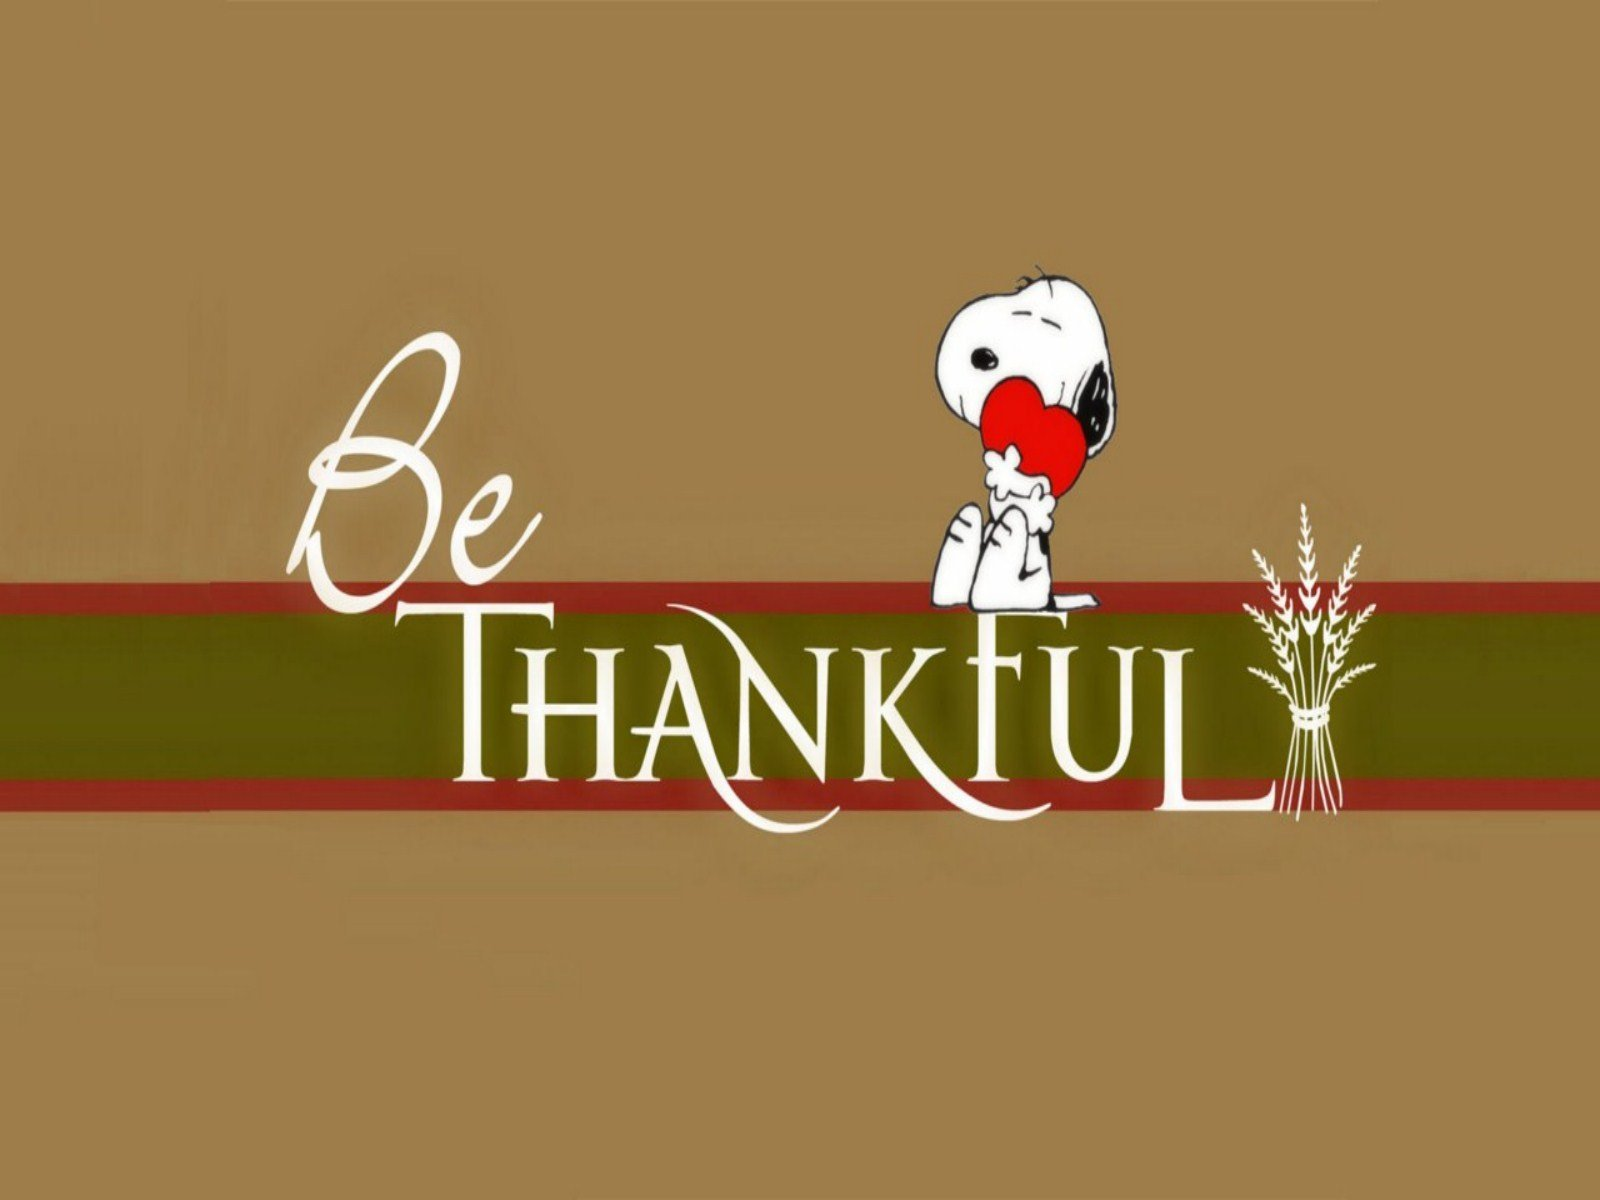 Free Disney Thanksgiving Wallpapers Widescreen Long